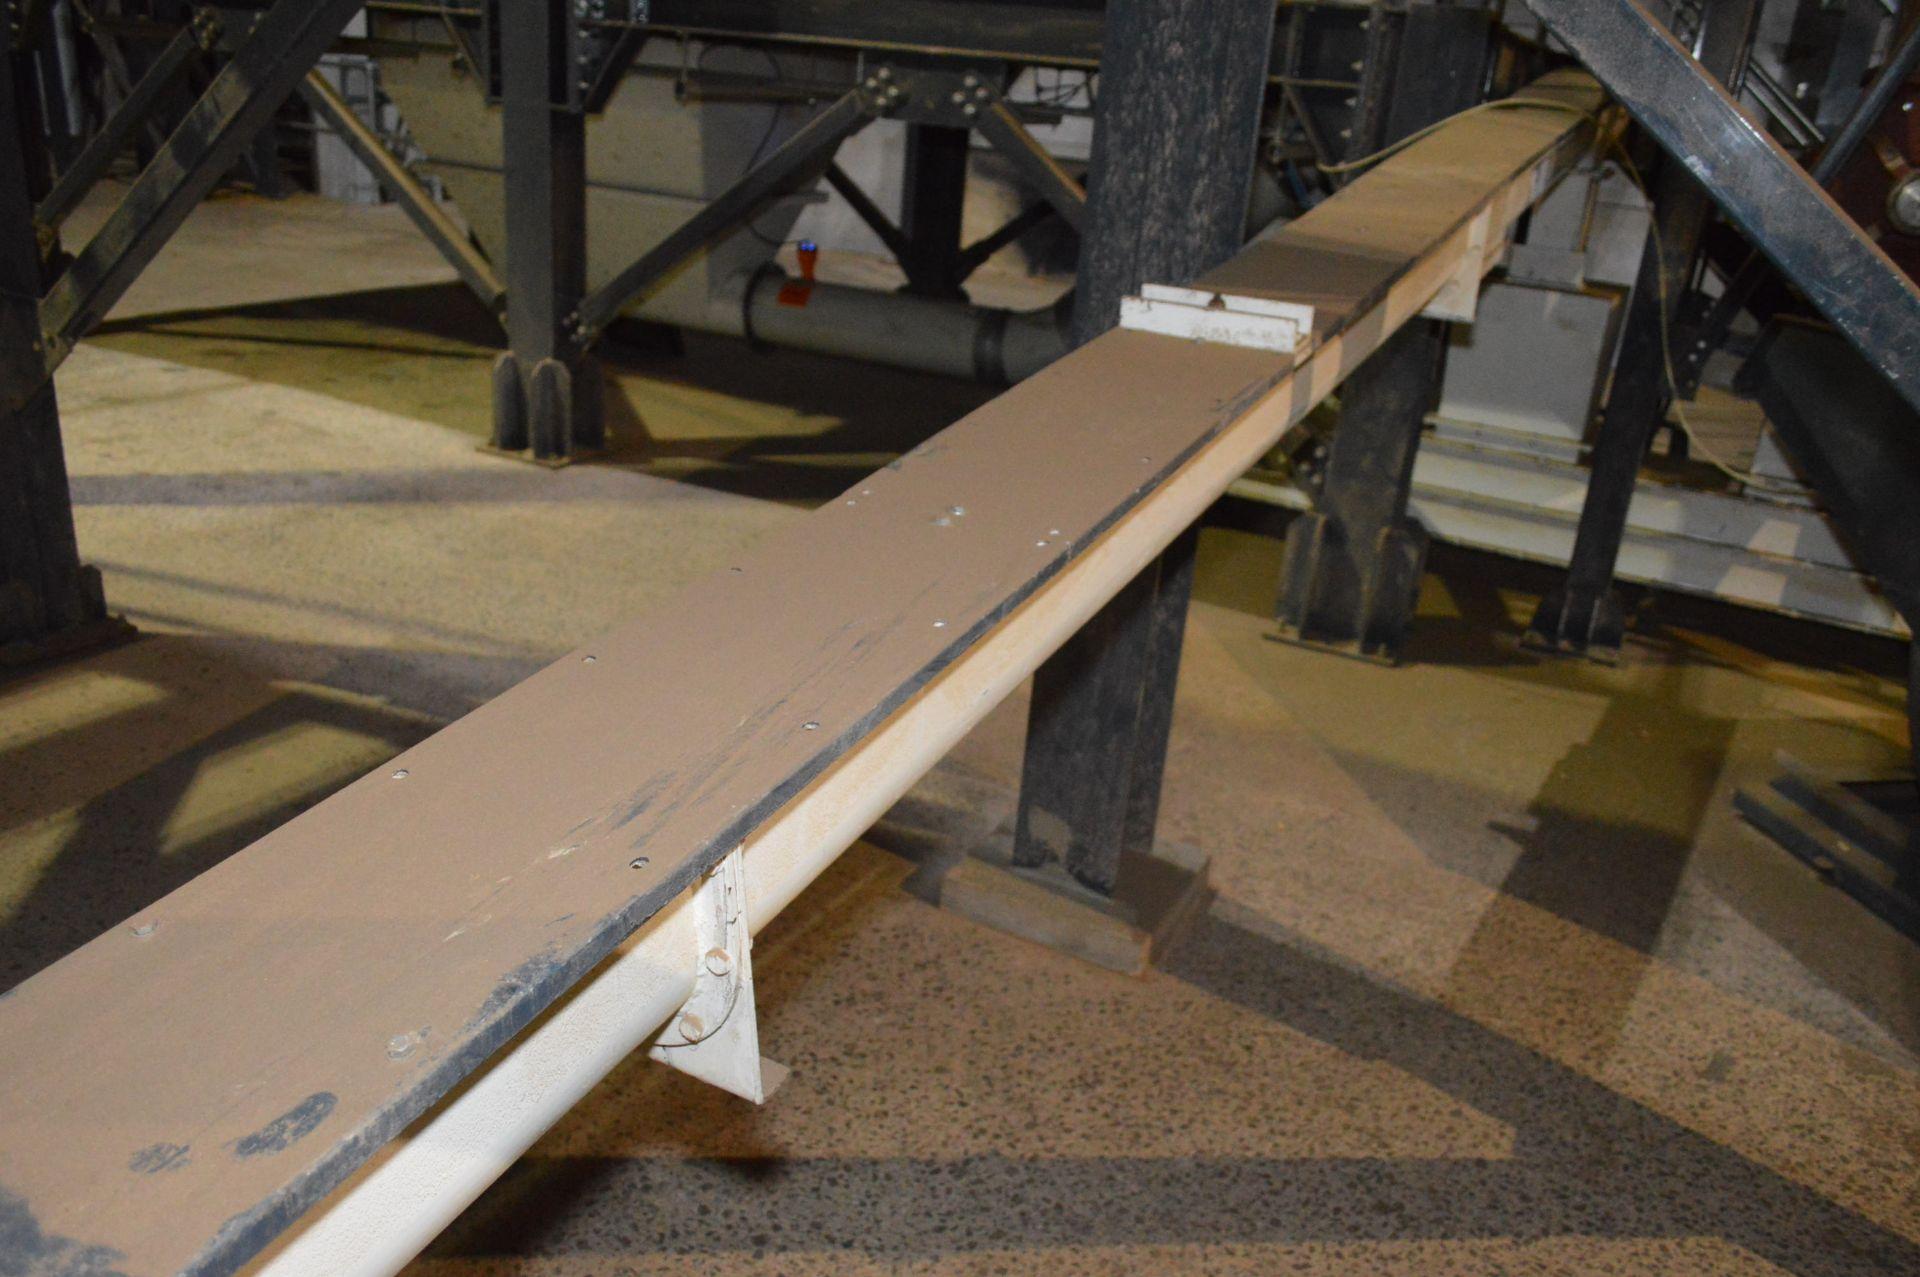 Lot 9 - Feedtech 150mm dia. Inclined Screw Conveyor, 6.9m long, 150mm x 6860mm, serial no. 208 01 001,